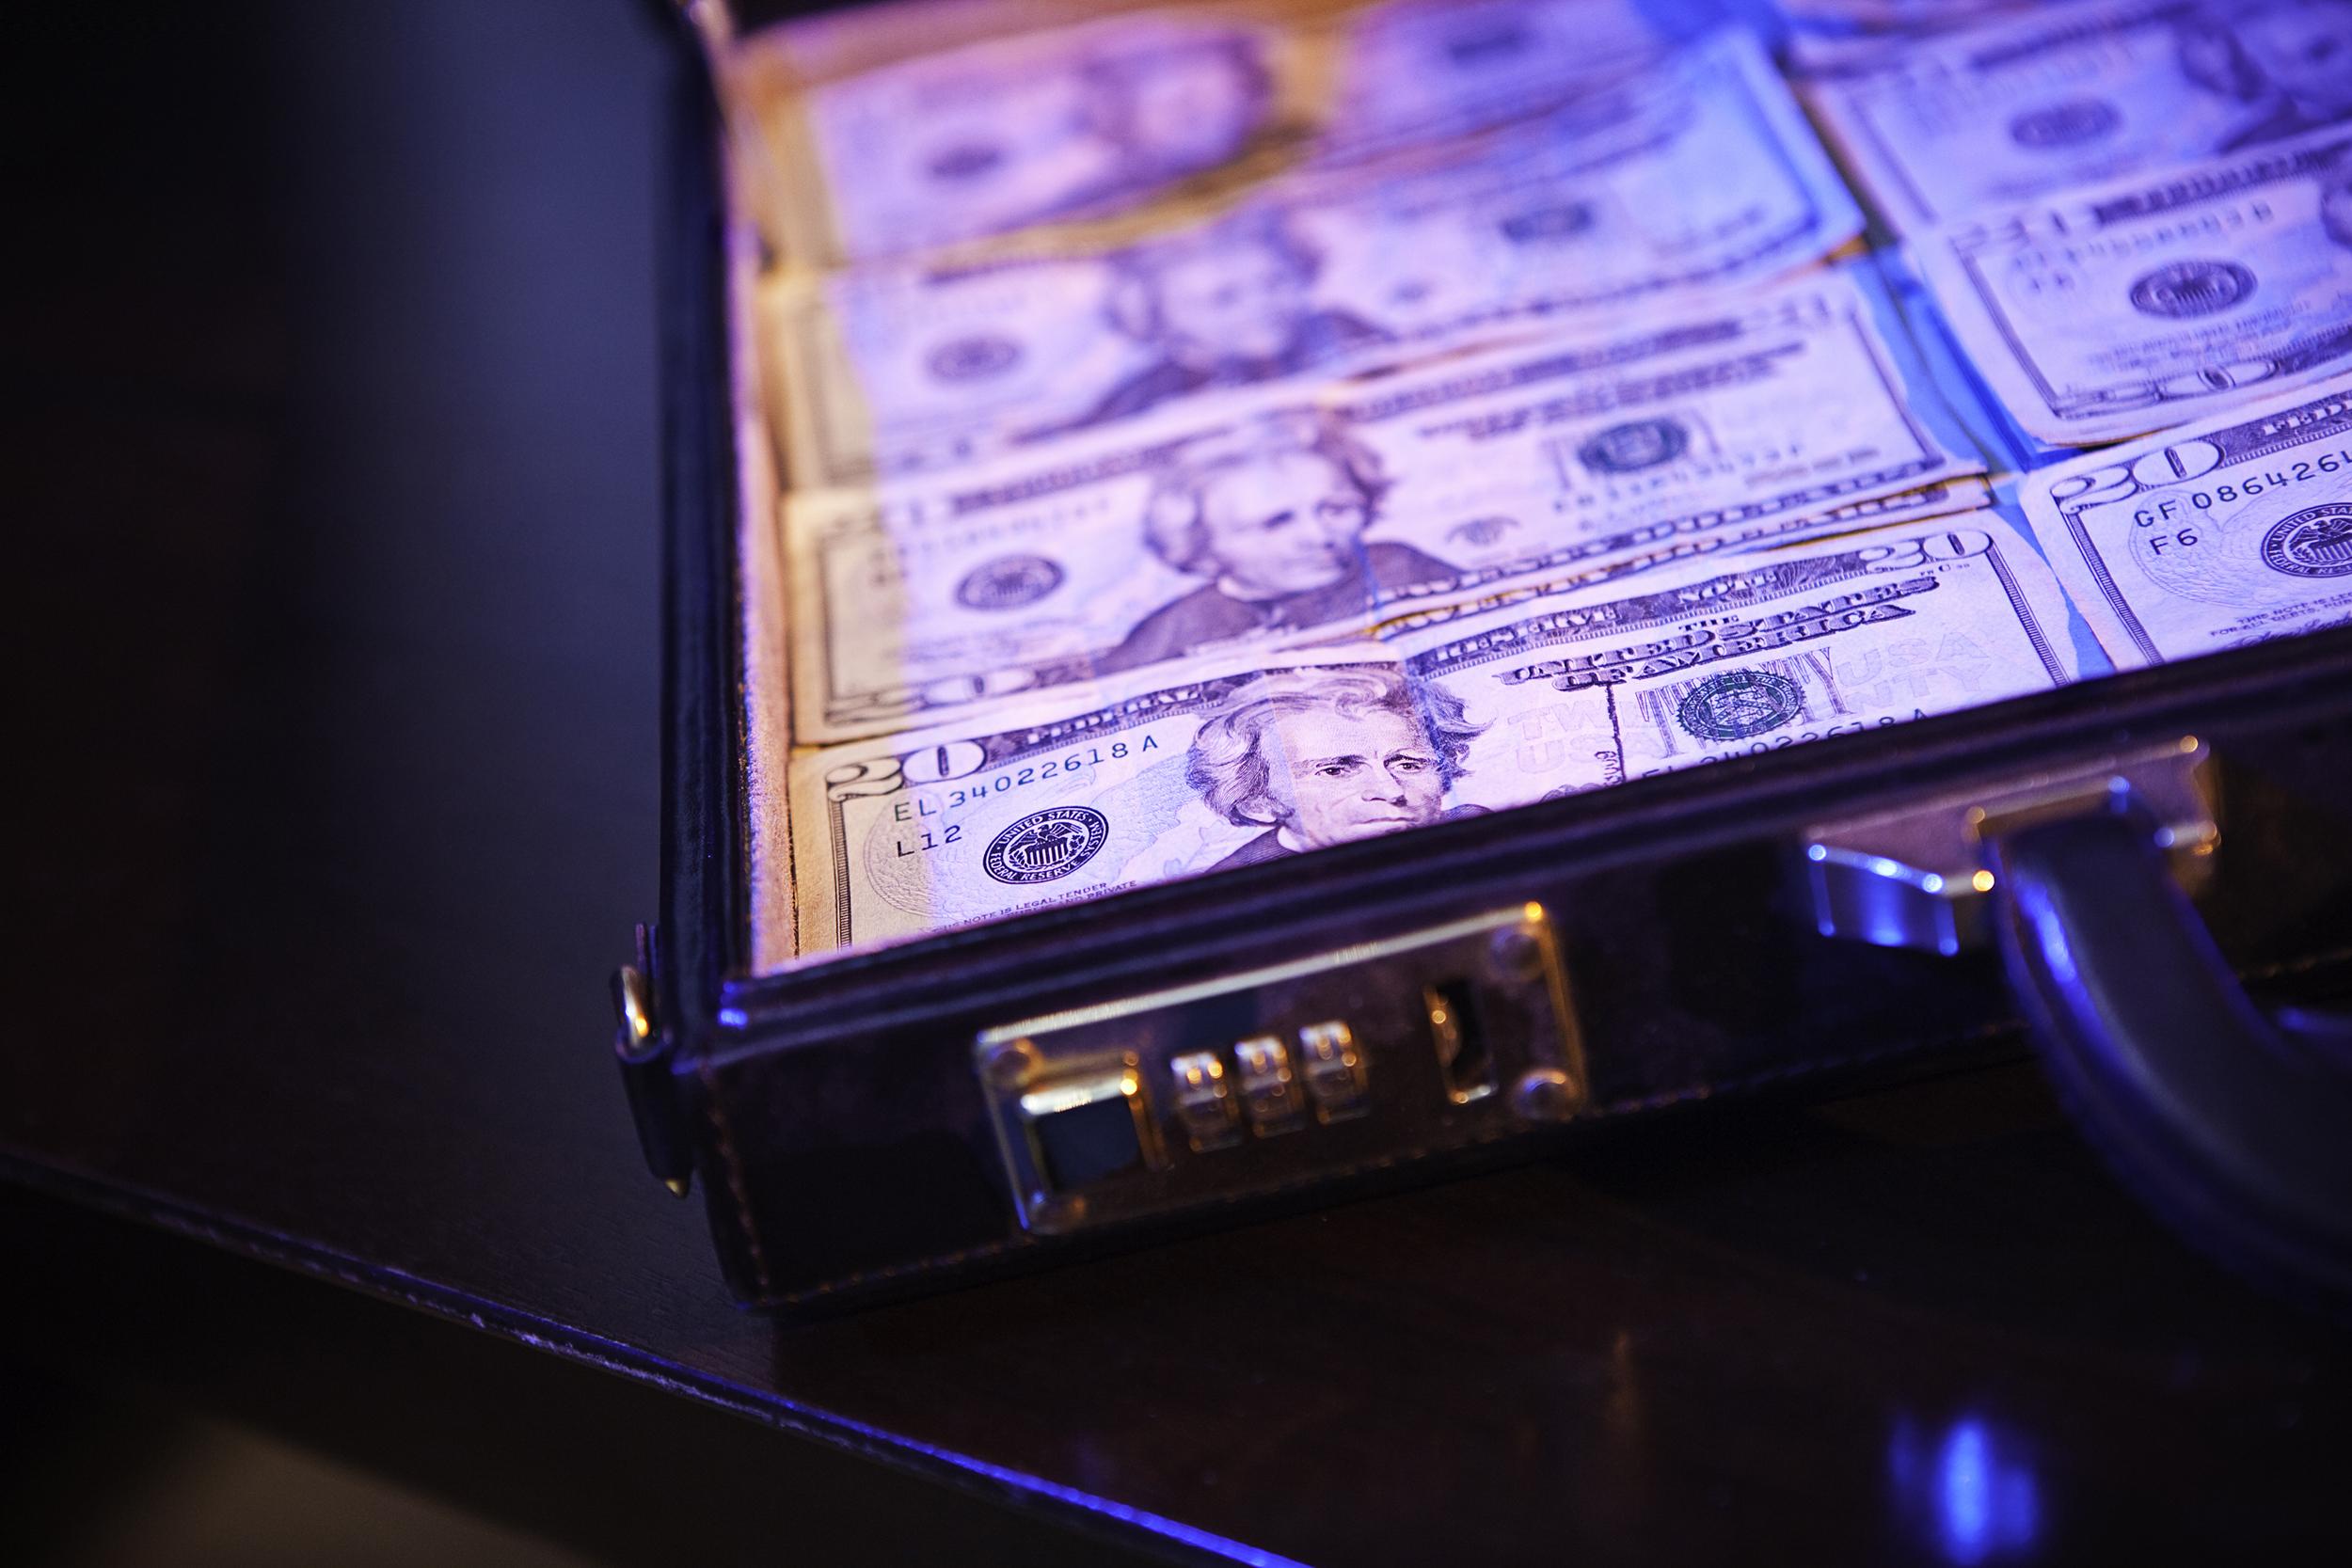 210212-cash-in-briefcase-stock-se-546p_8